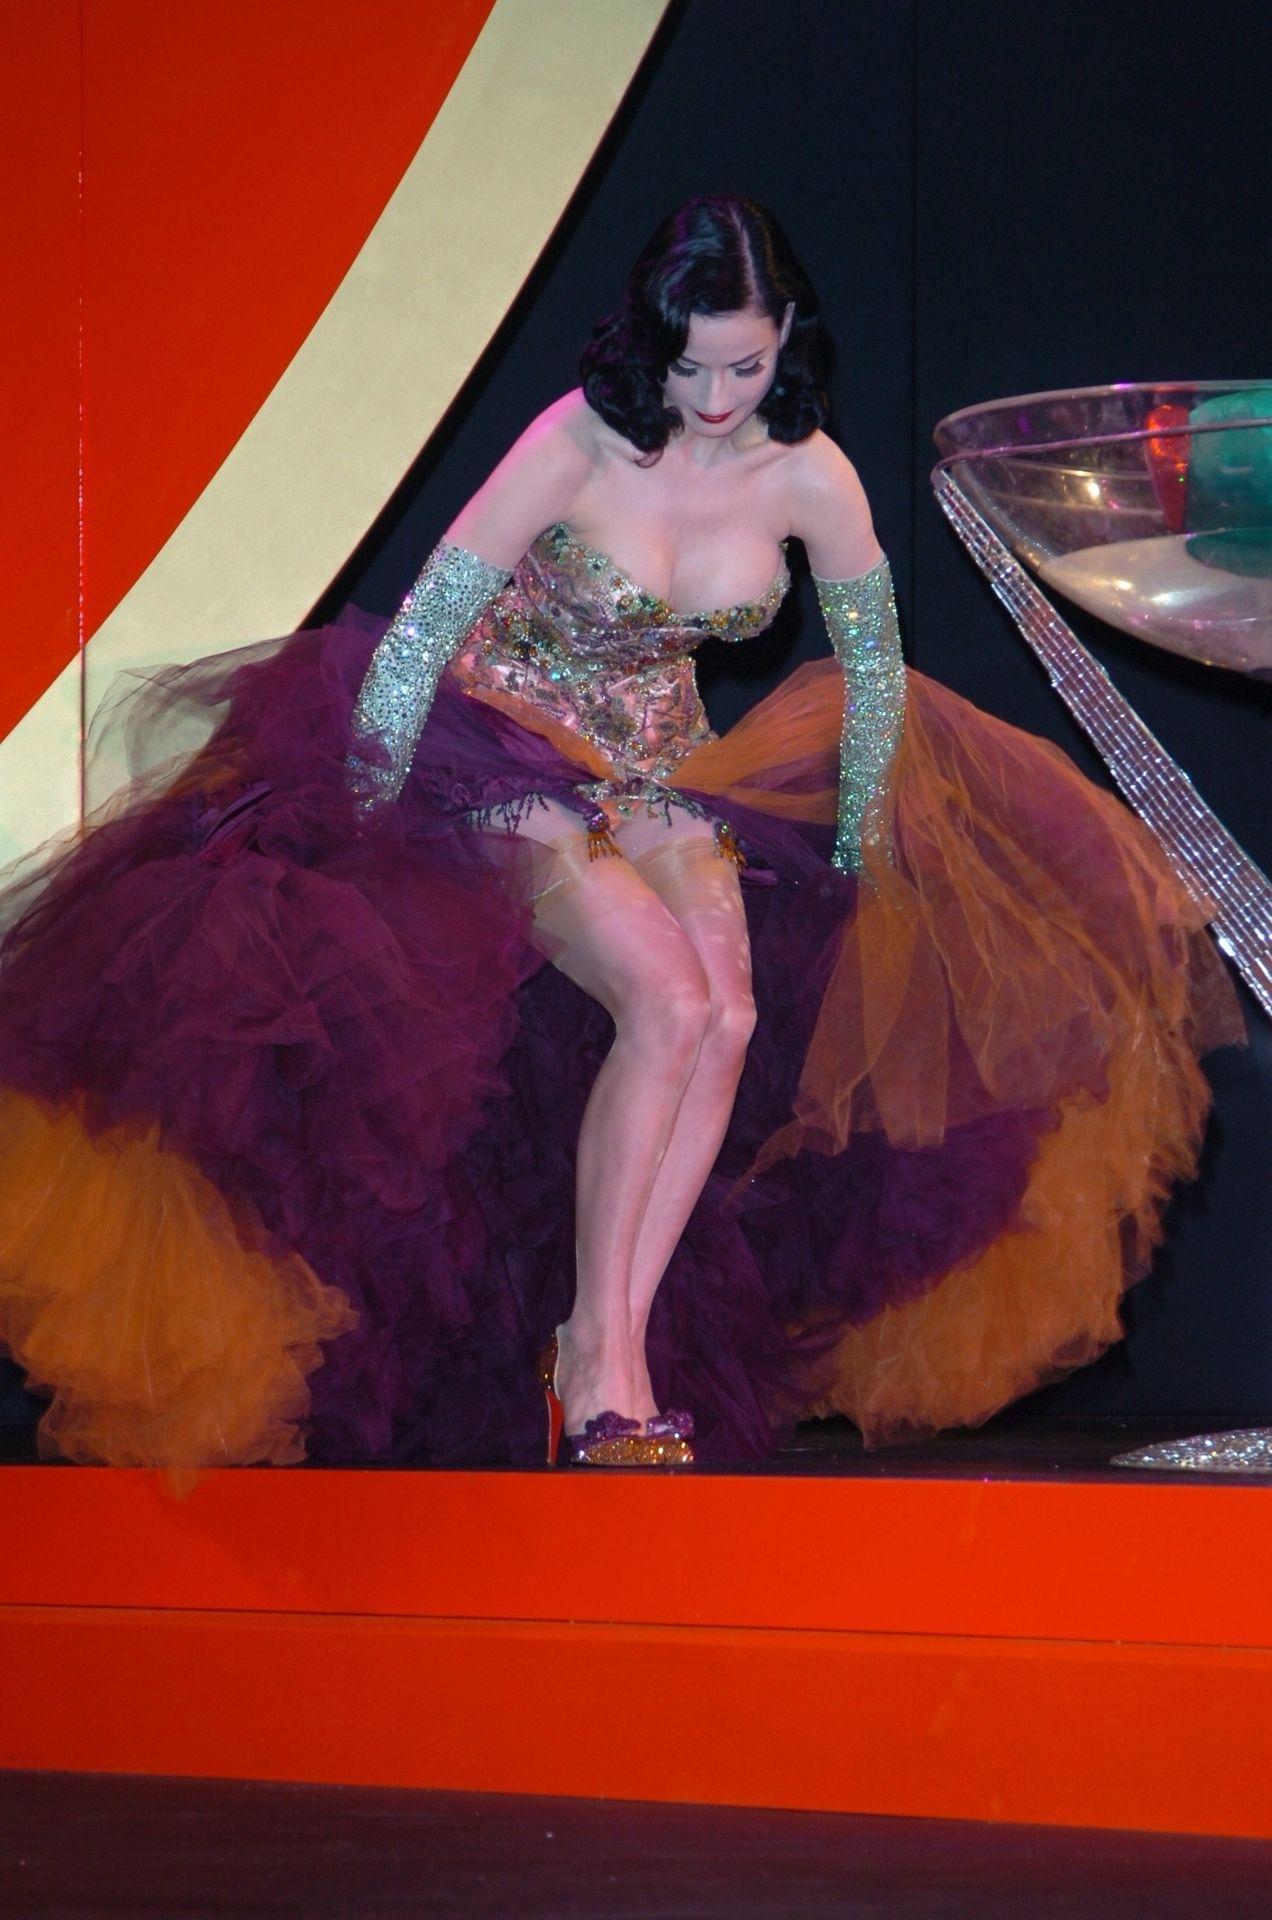 Dita Von Teese Performs At Erotica 06 In London 0008